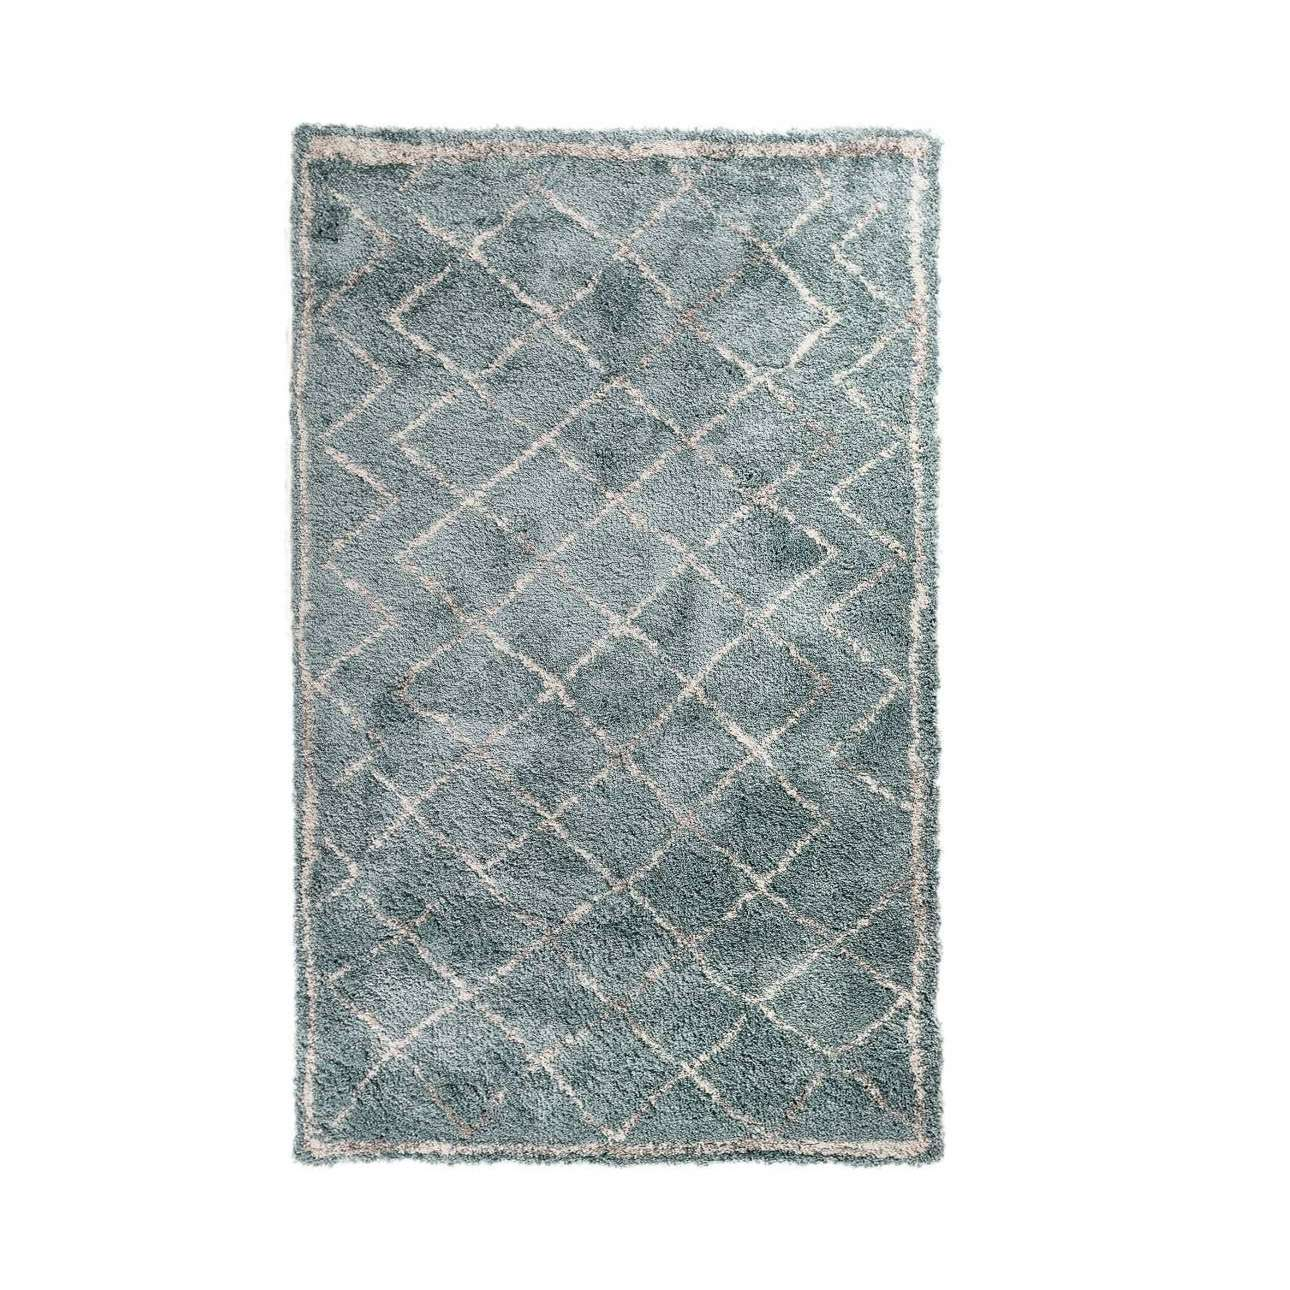 Koberec Royal Teal Blue 160x230cm